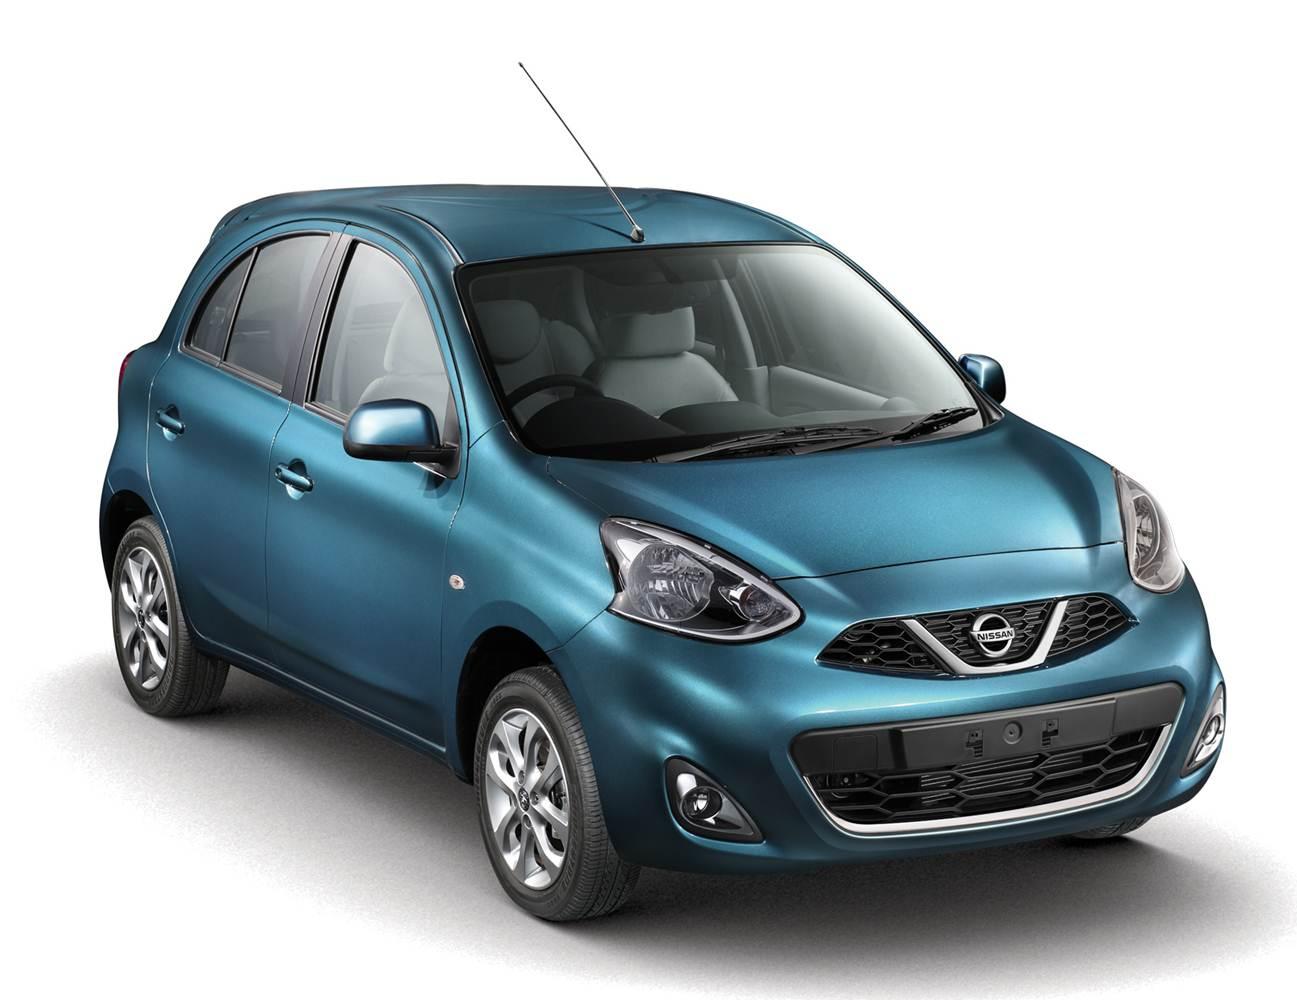 2013-Nissan-Micra-India